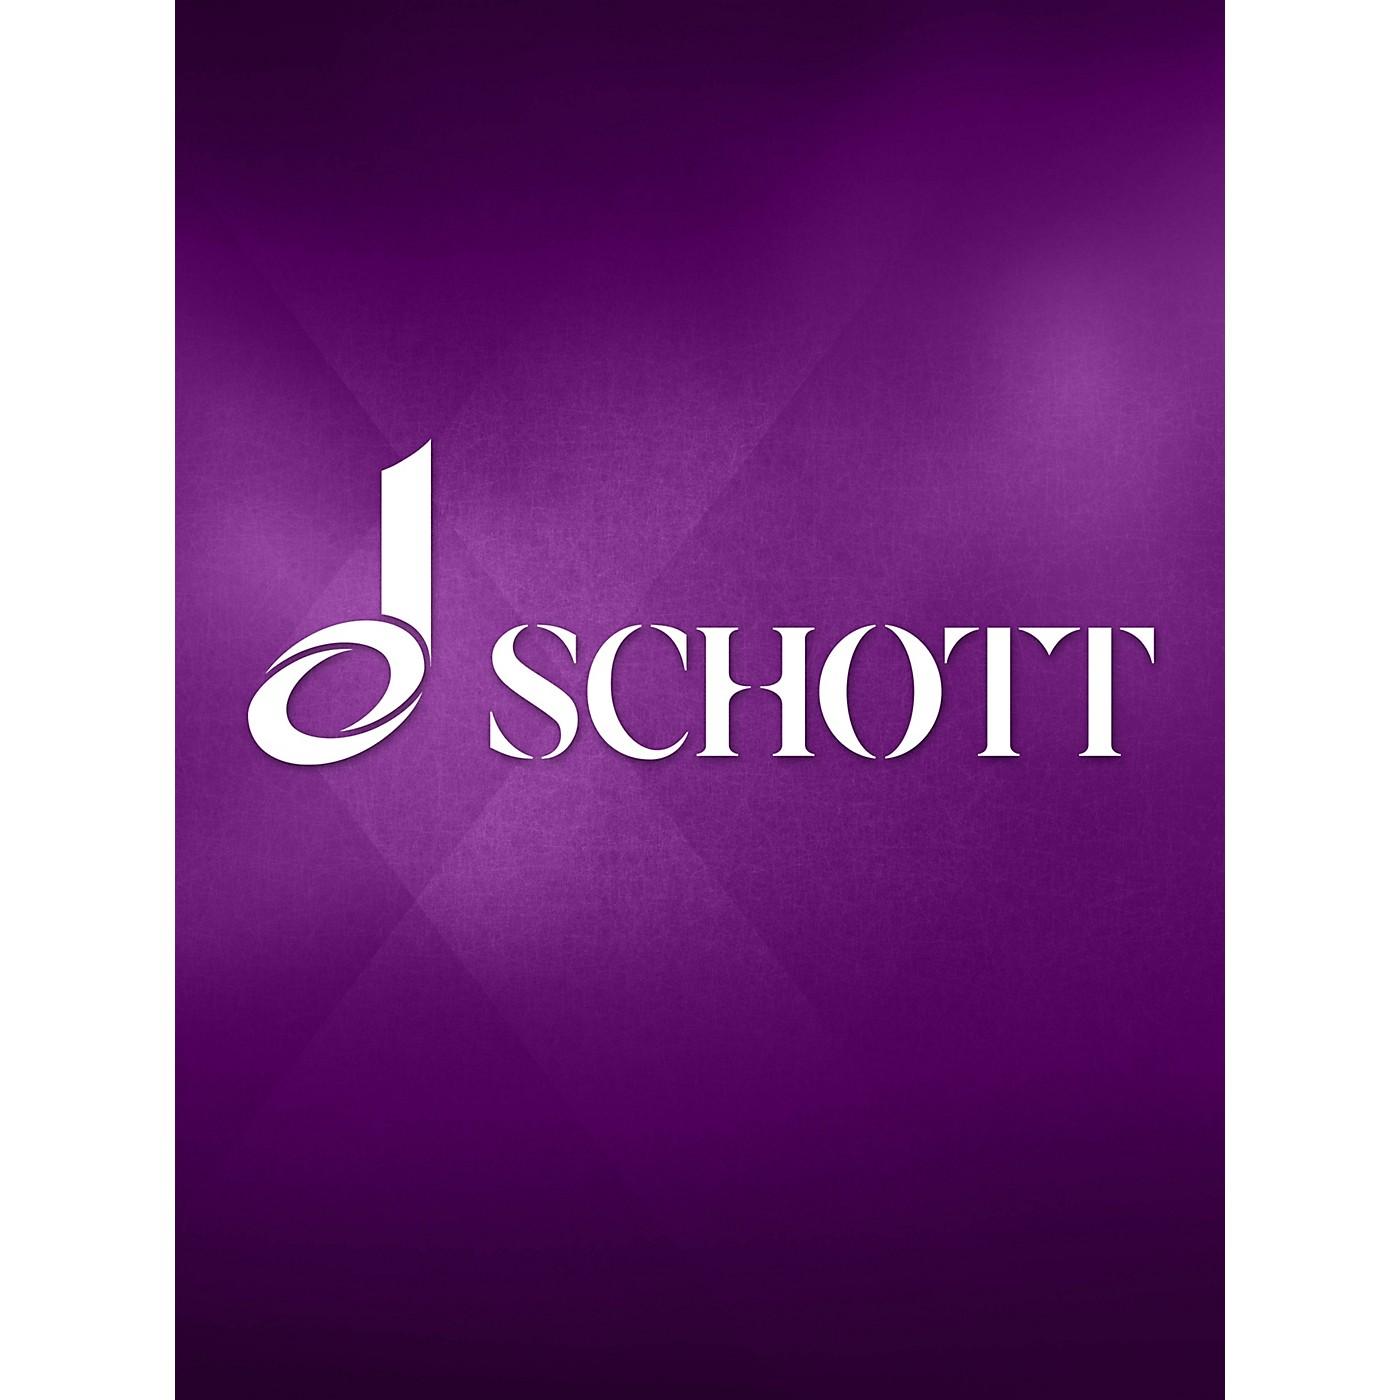 Eulenburg Concerto Grosso in E minor Op. 3, No. 6 (Solo Violin II Part) Schott Series by Francesco Geminiani thumbnail